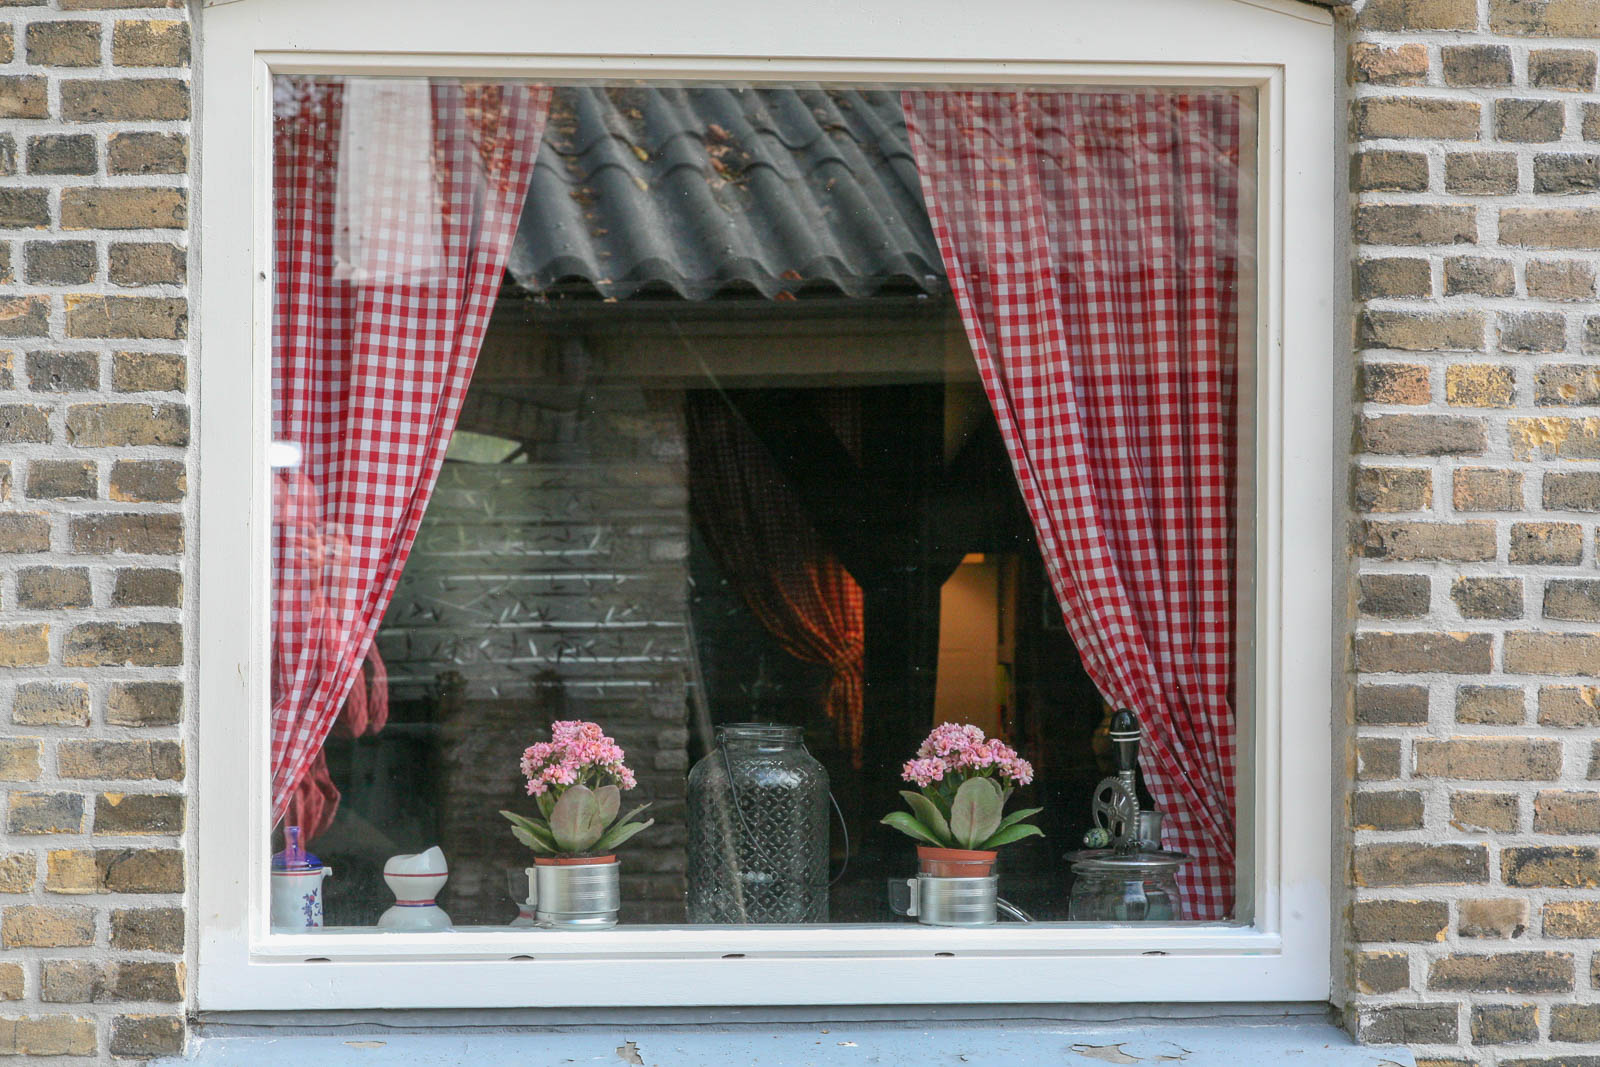 Hillegondahoeve-De Oude Stal-1484